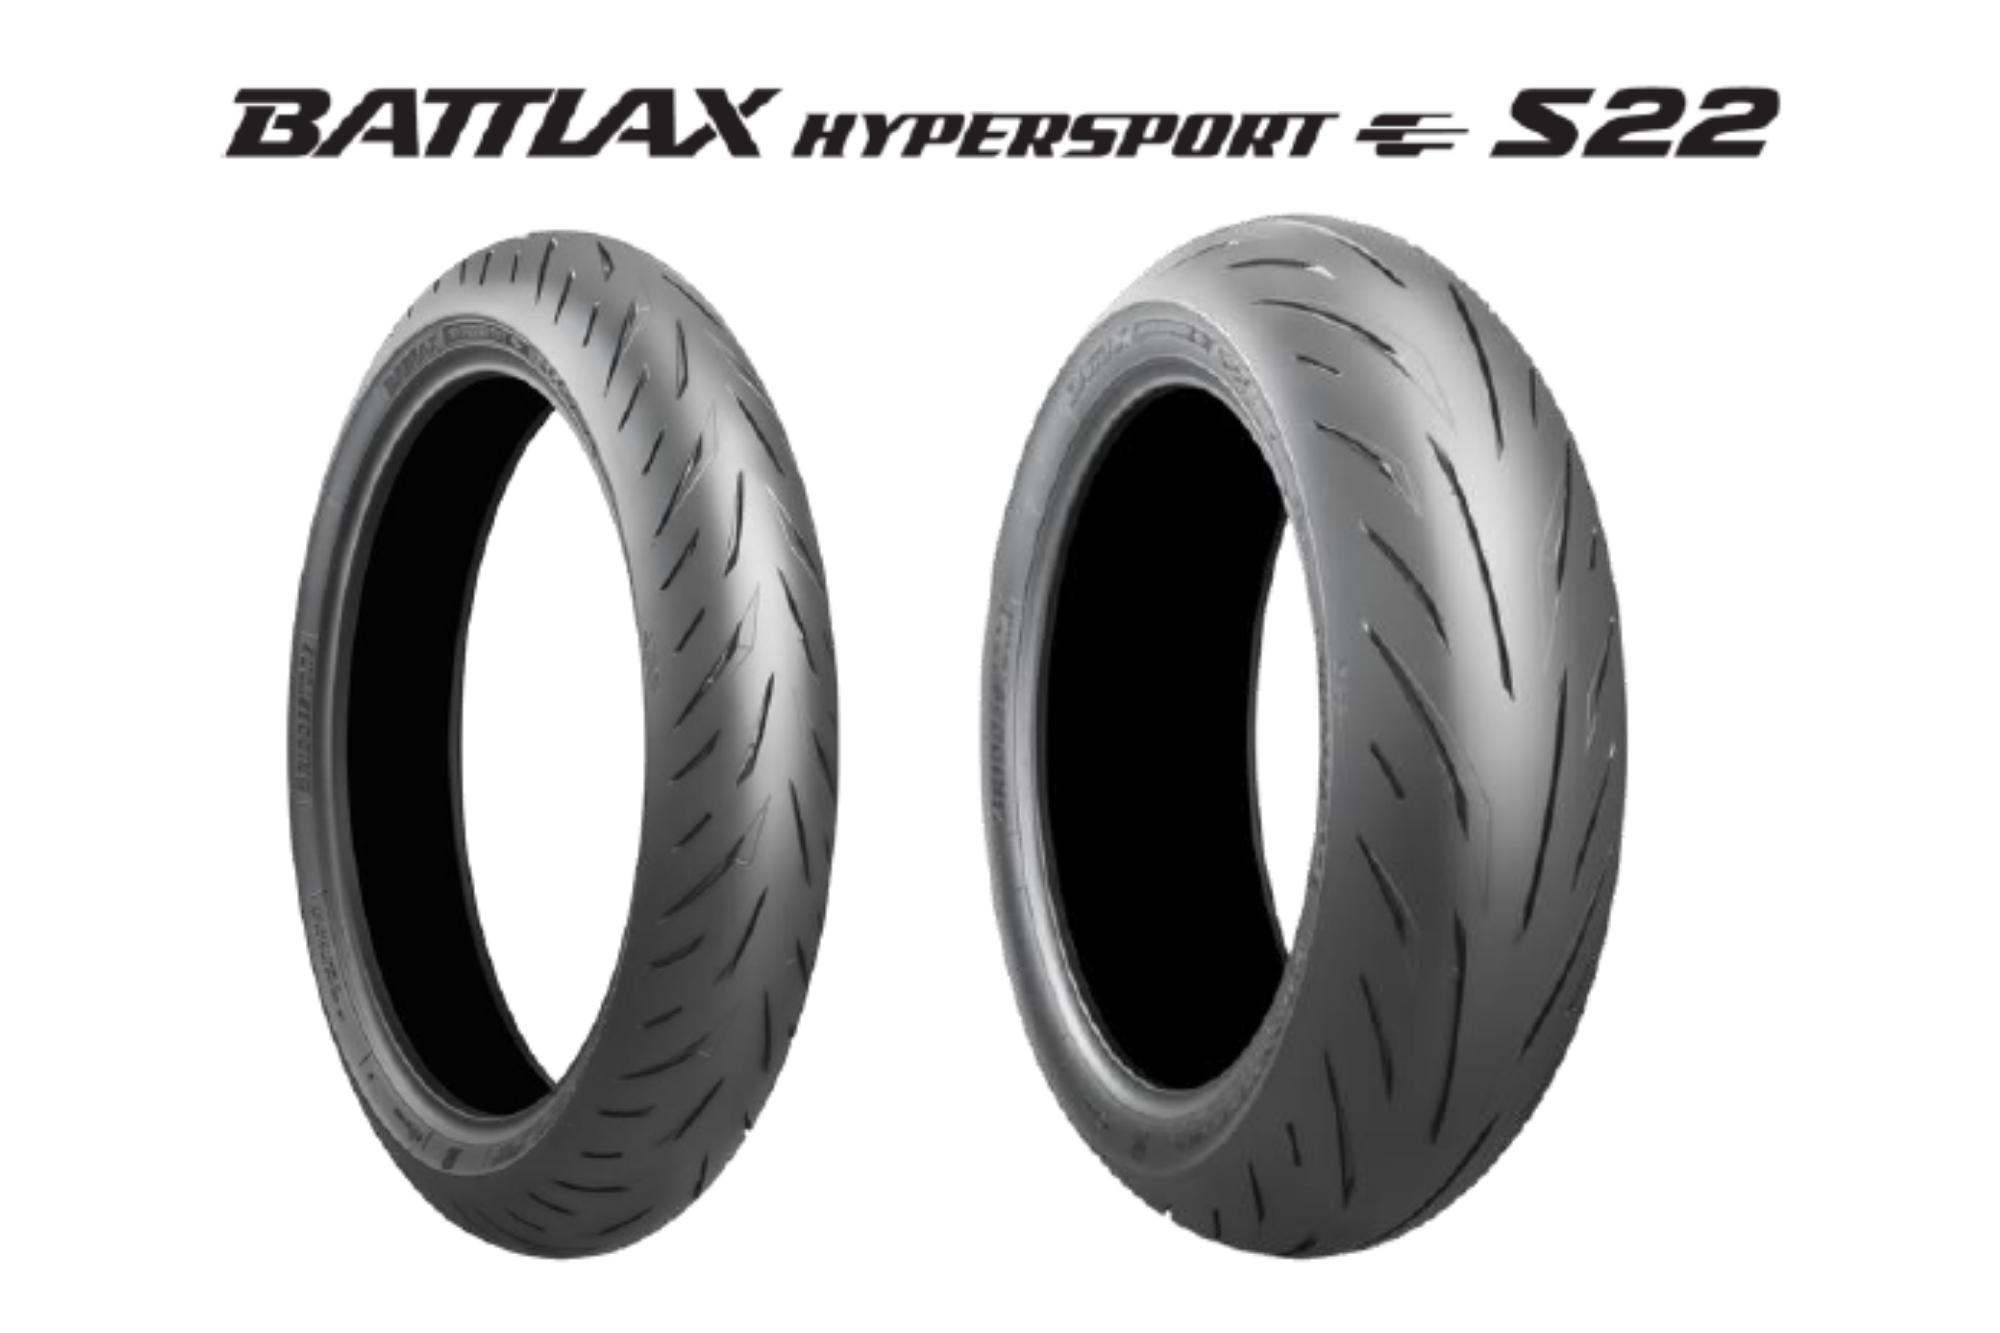 2022 Suzuki Hayabusa Tires